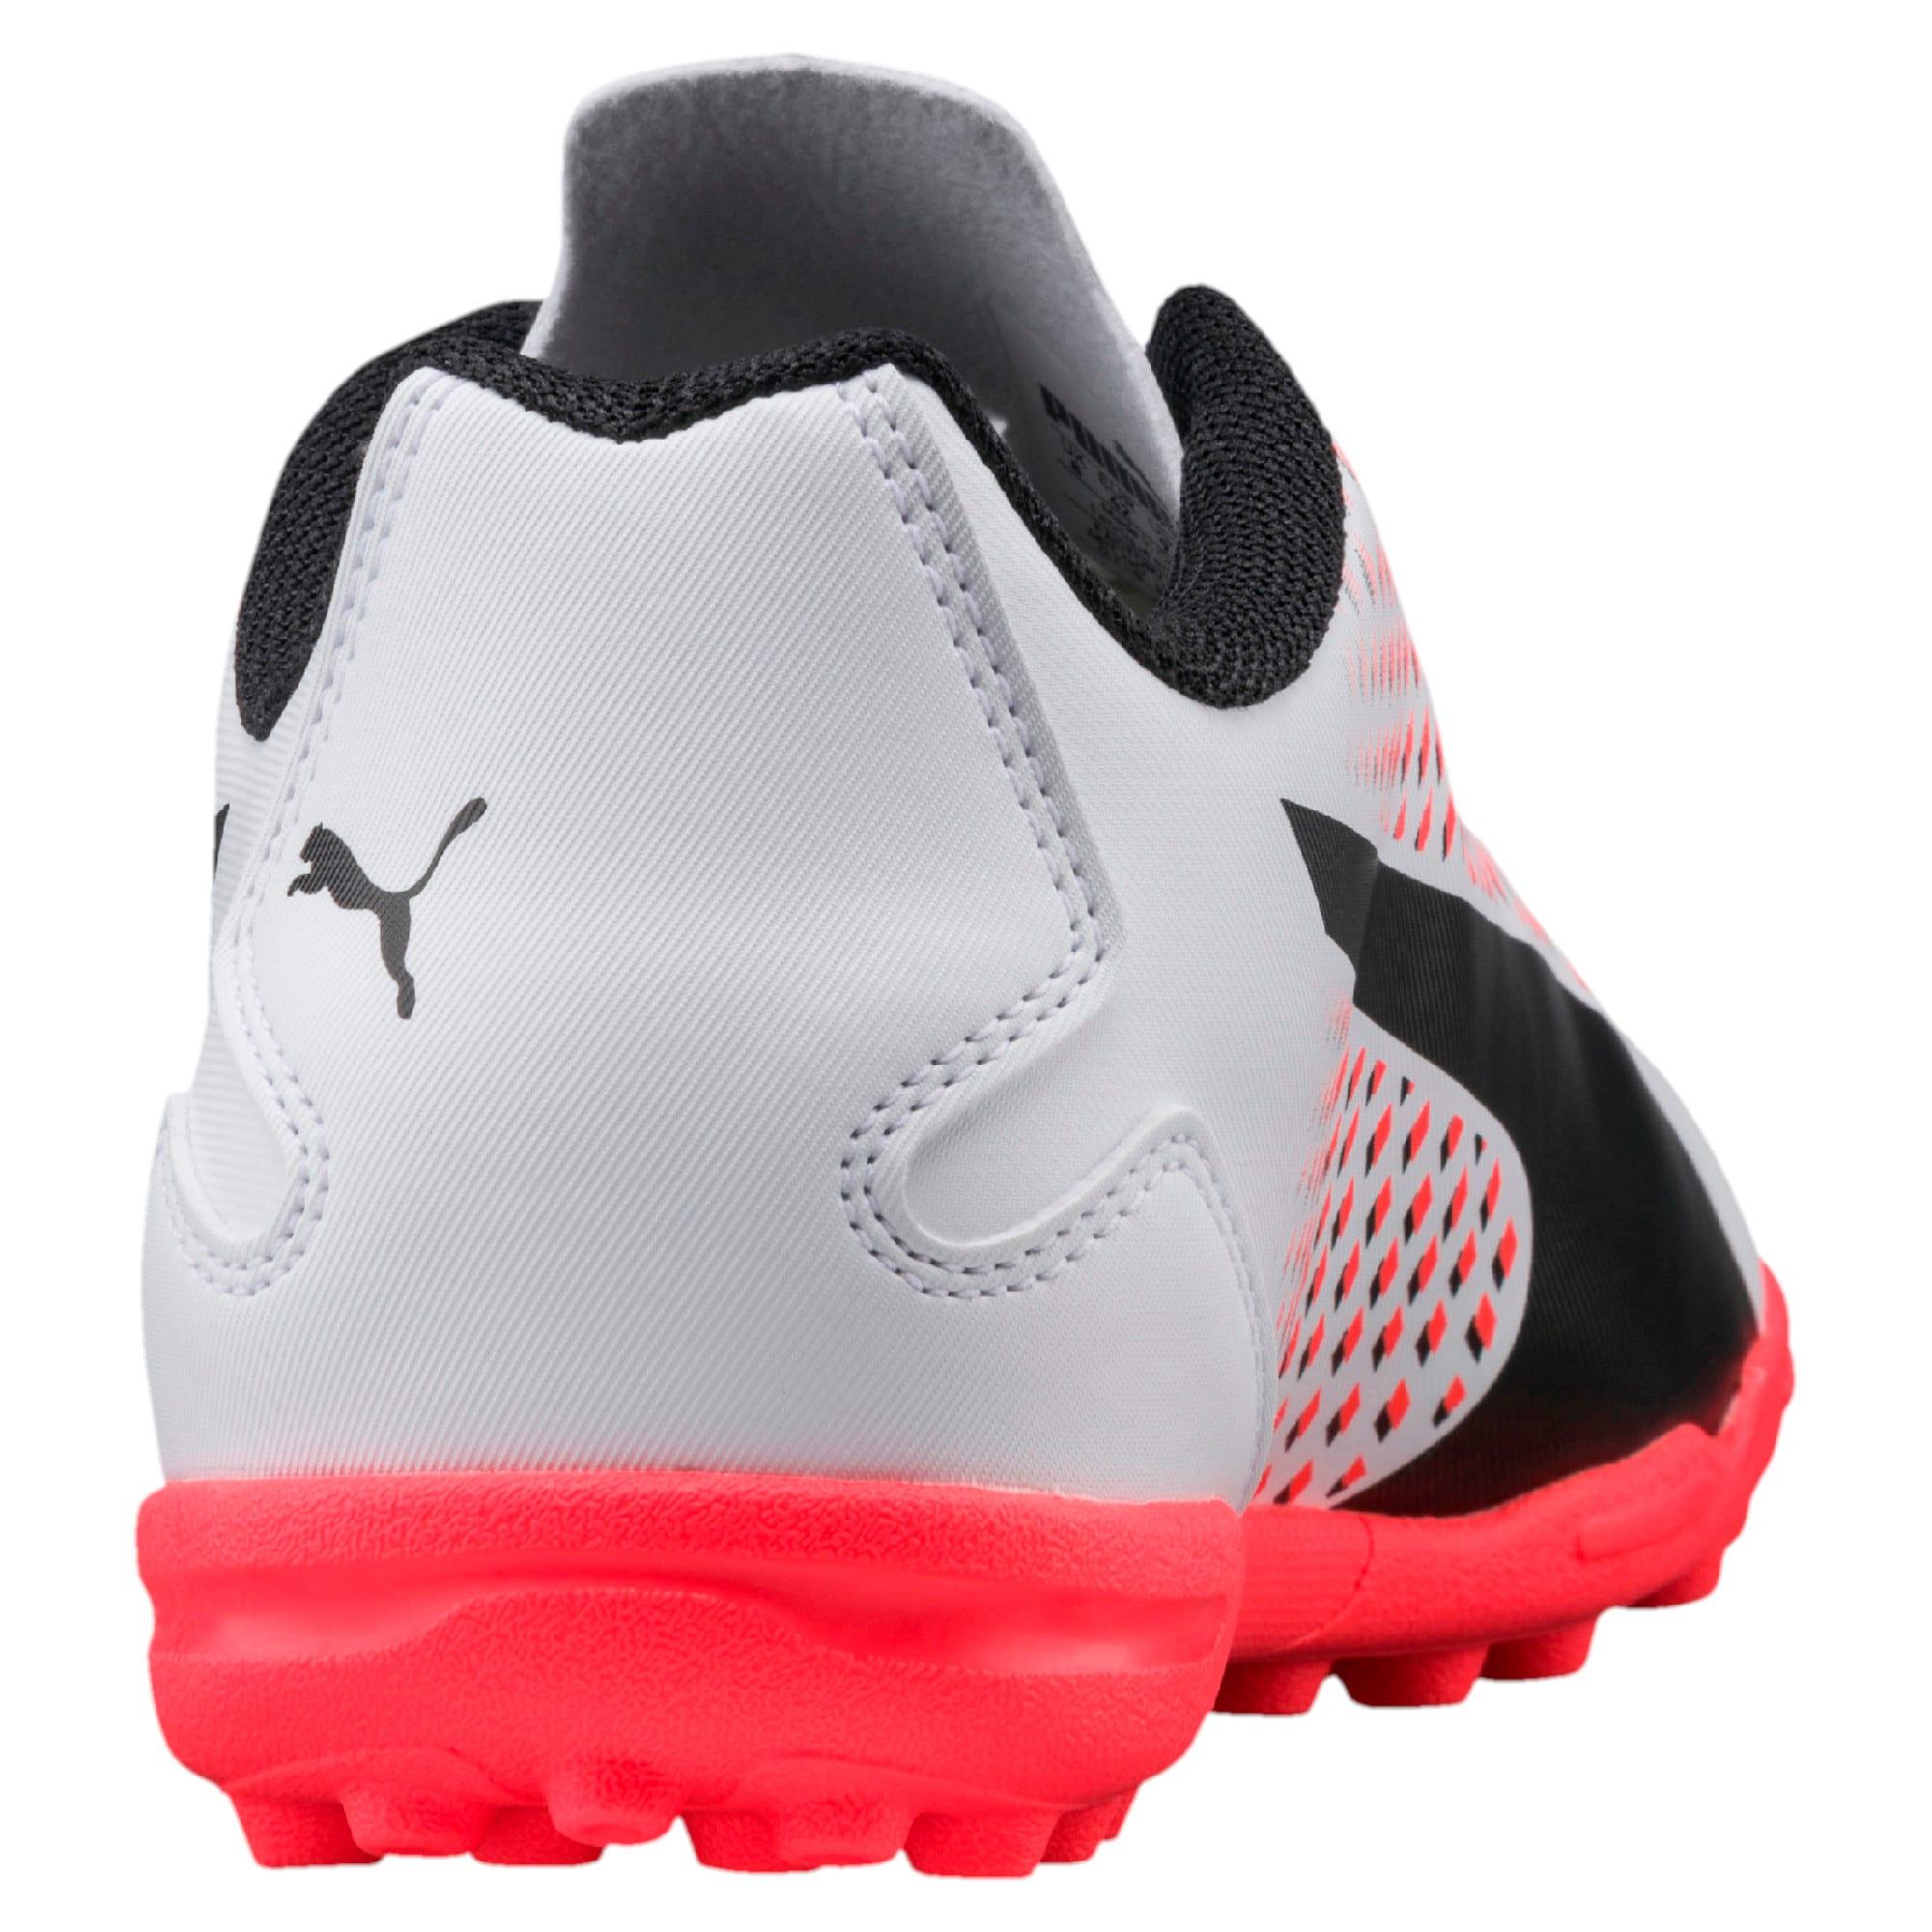 Thumbnail 3 of Adreno III TT Men's Football Boots, White-Black-Coral, medium-IND